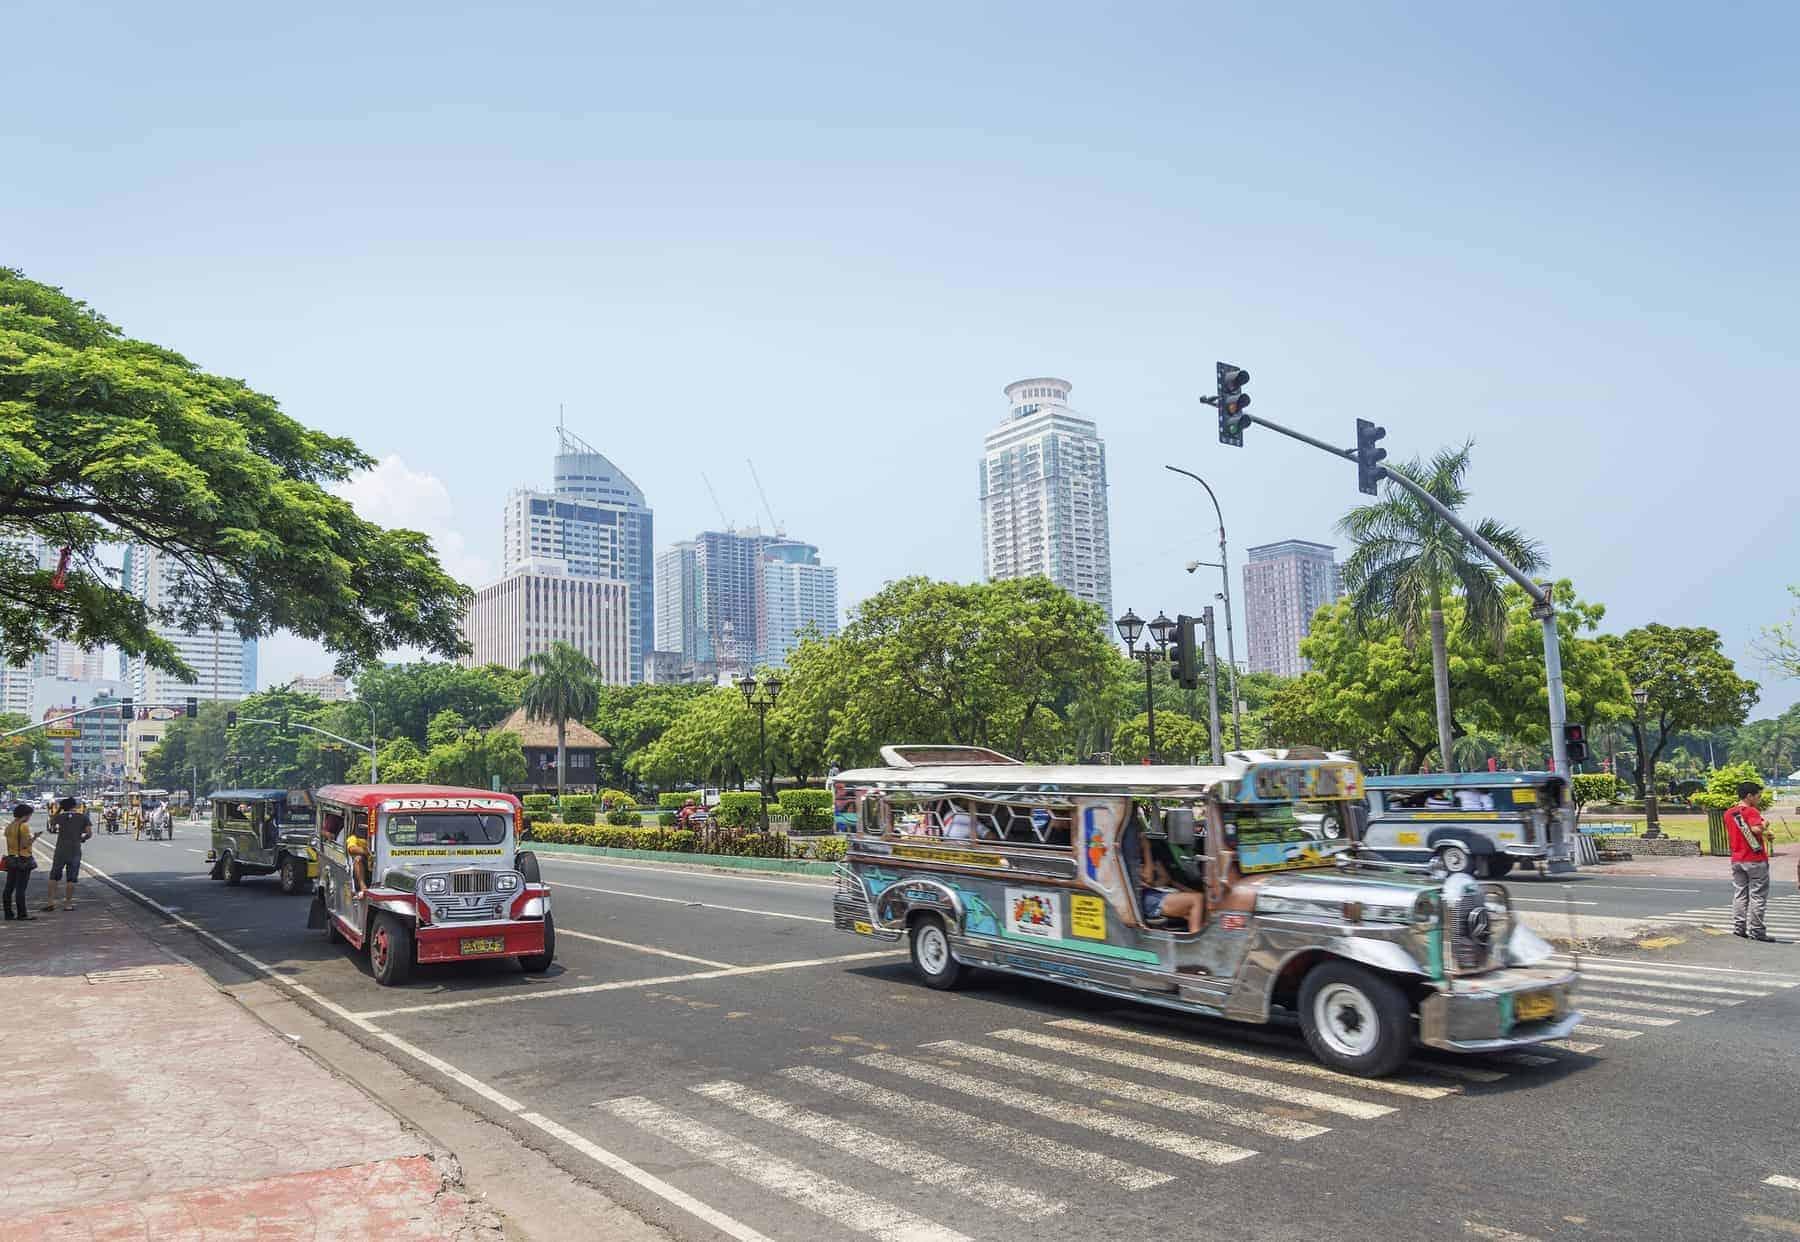 jeepneys in rizal park of manila philippines